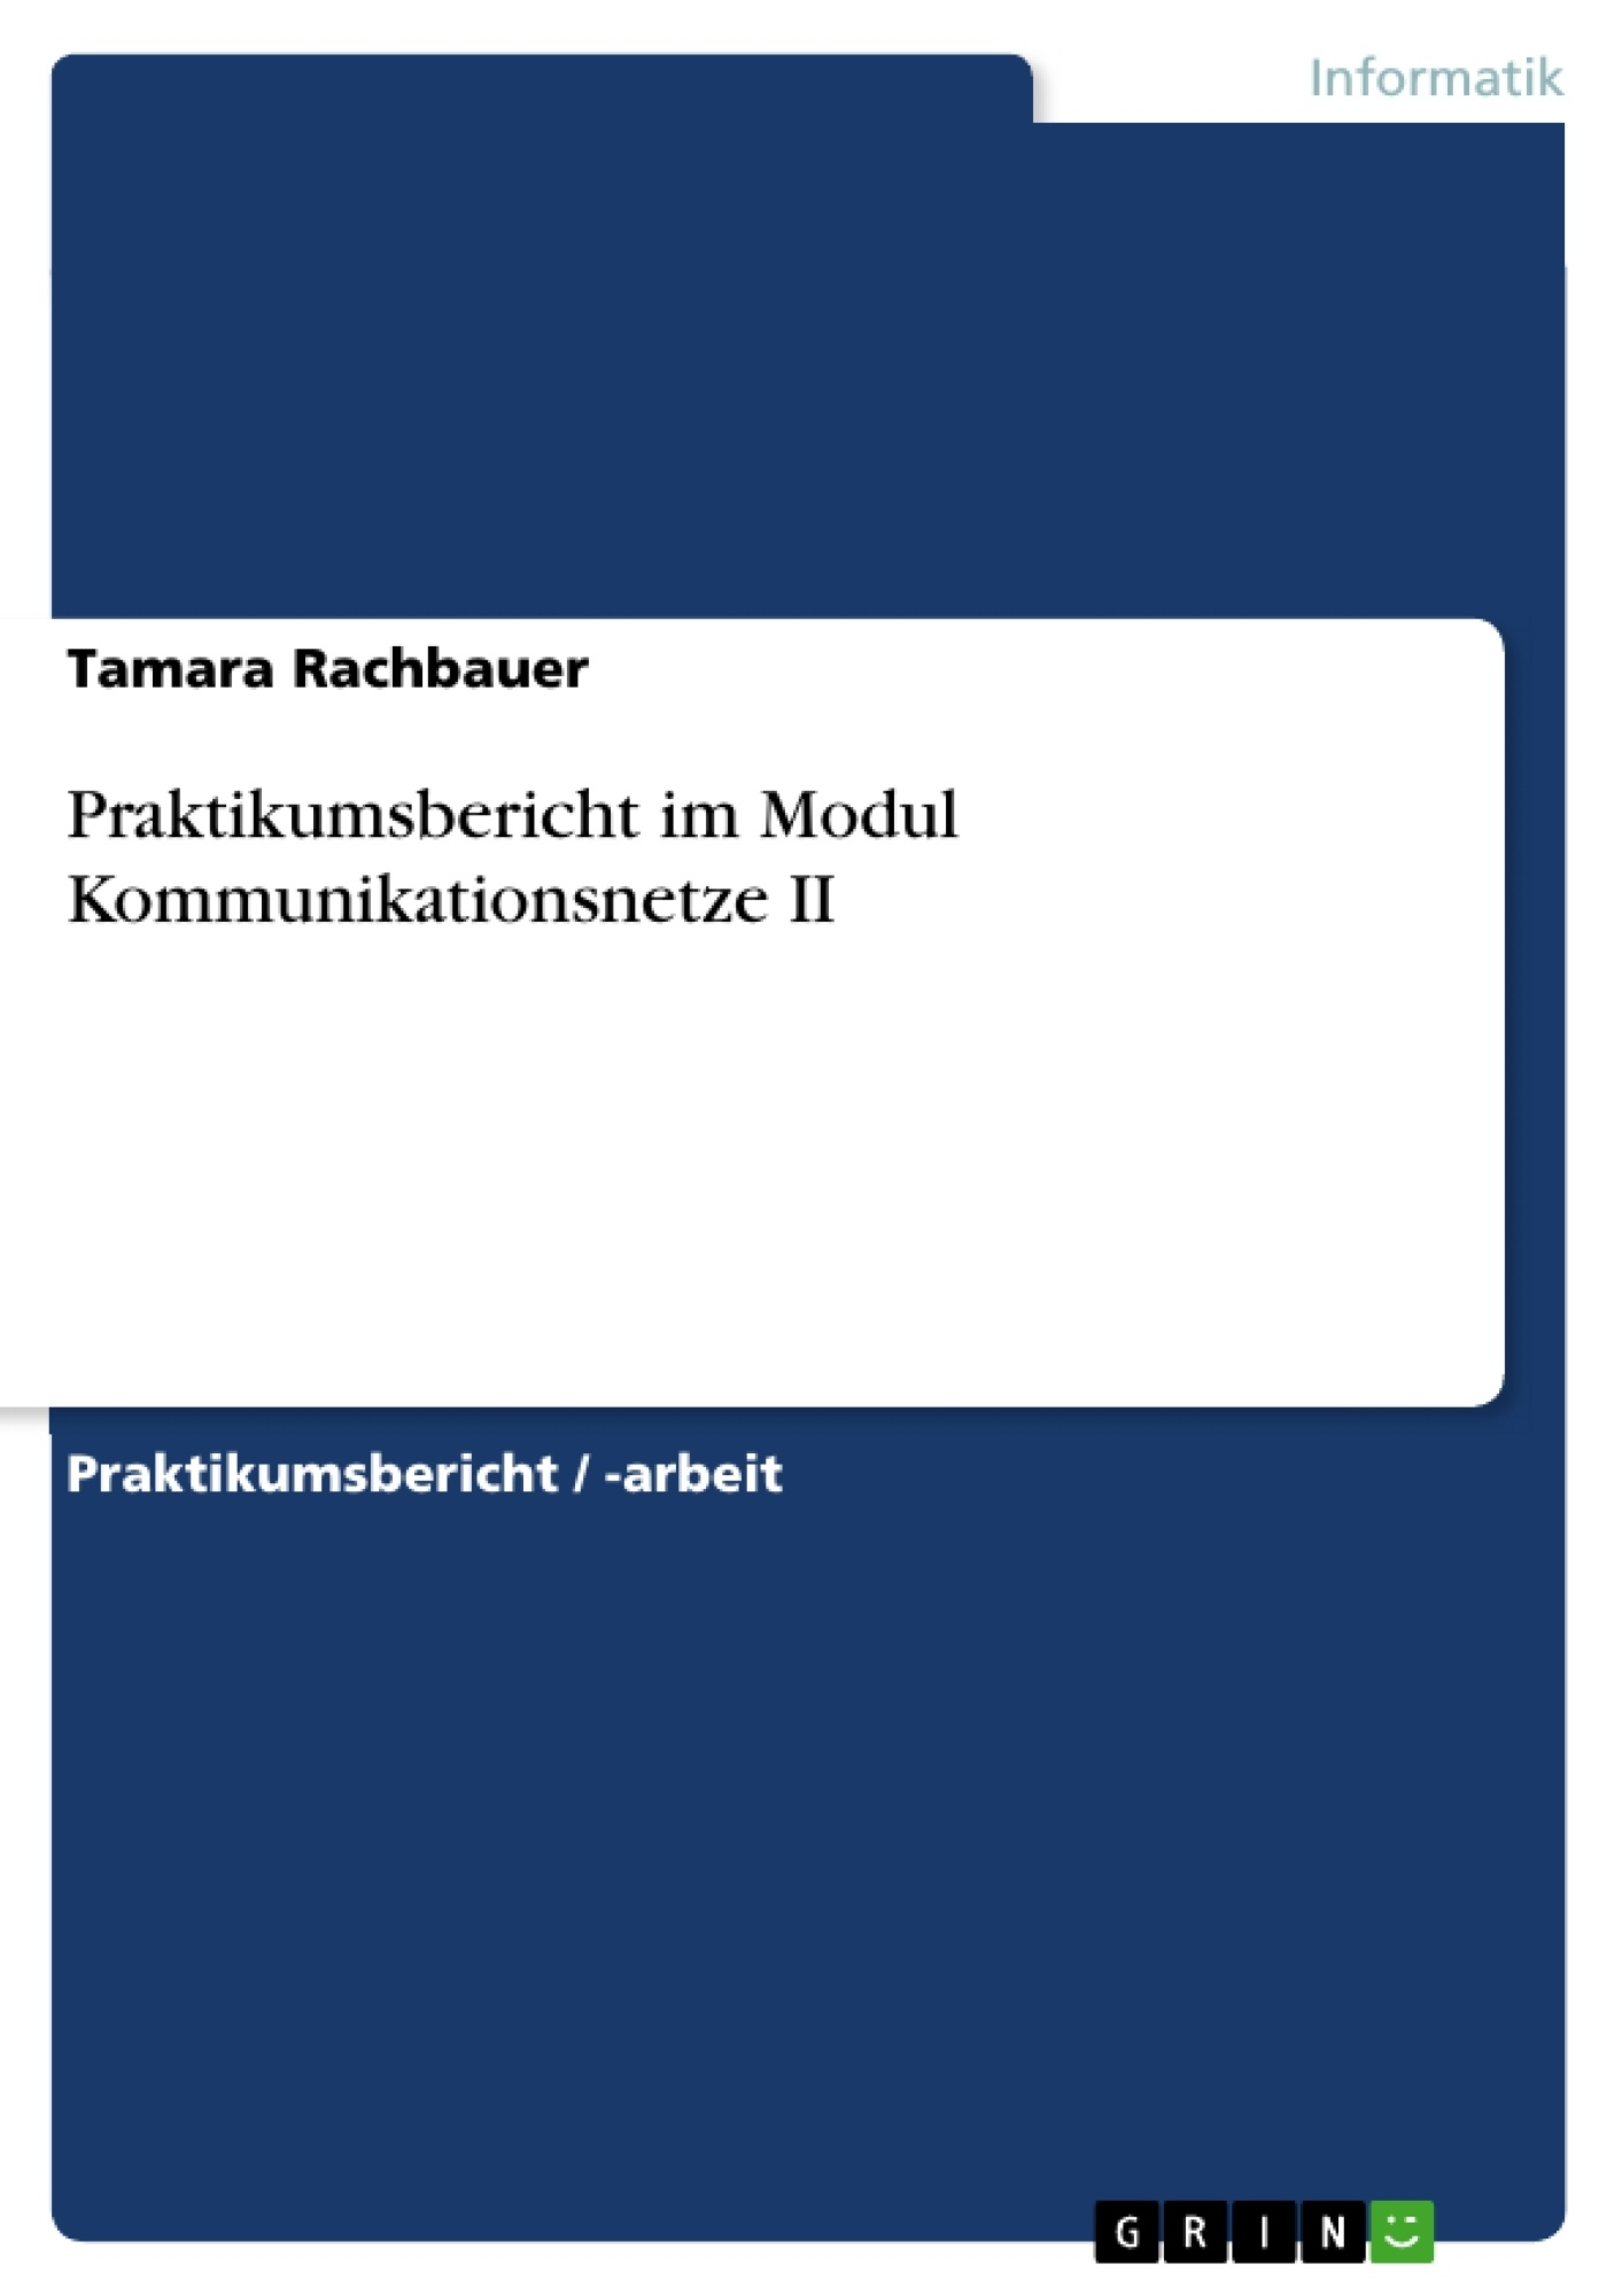 Titel: Praktikumsbericht im Modul Kommunikationsnetze II